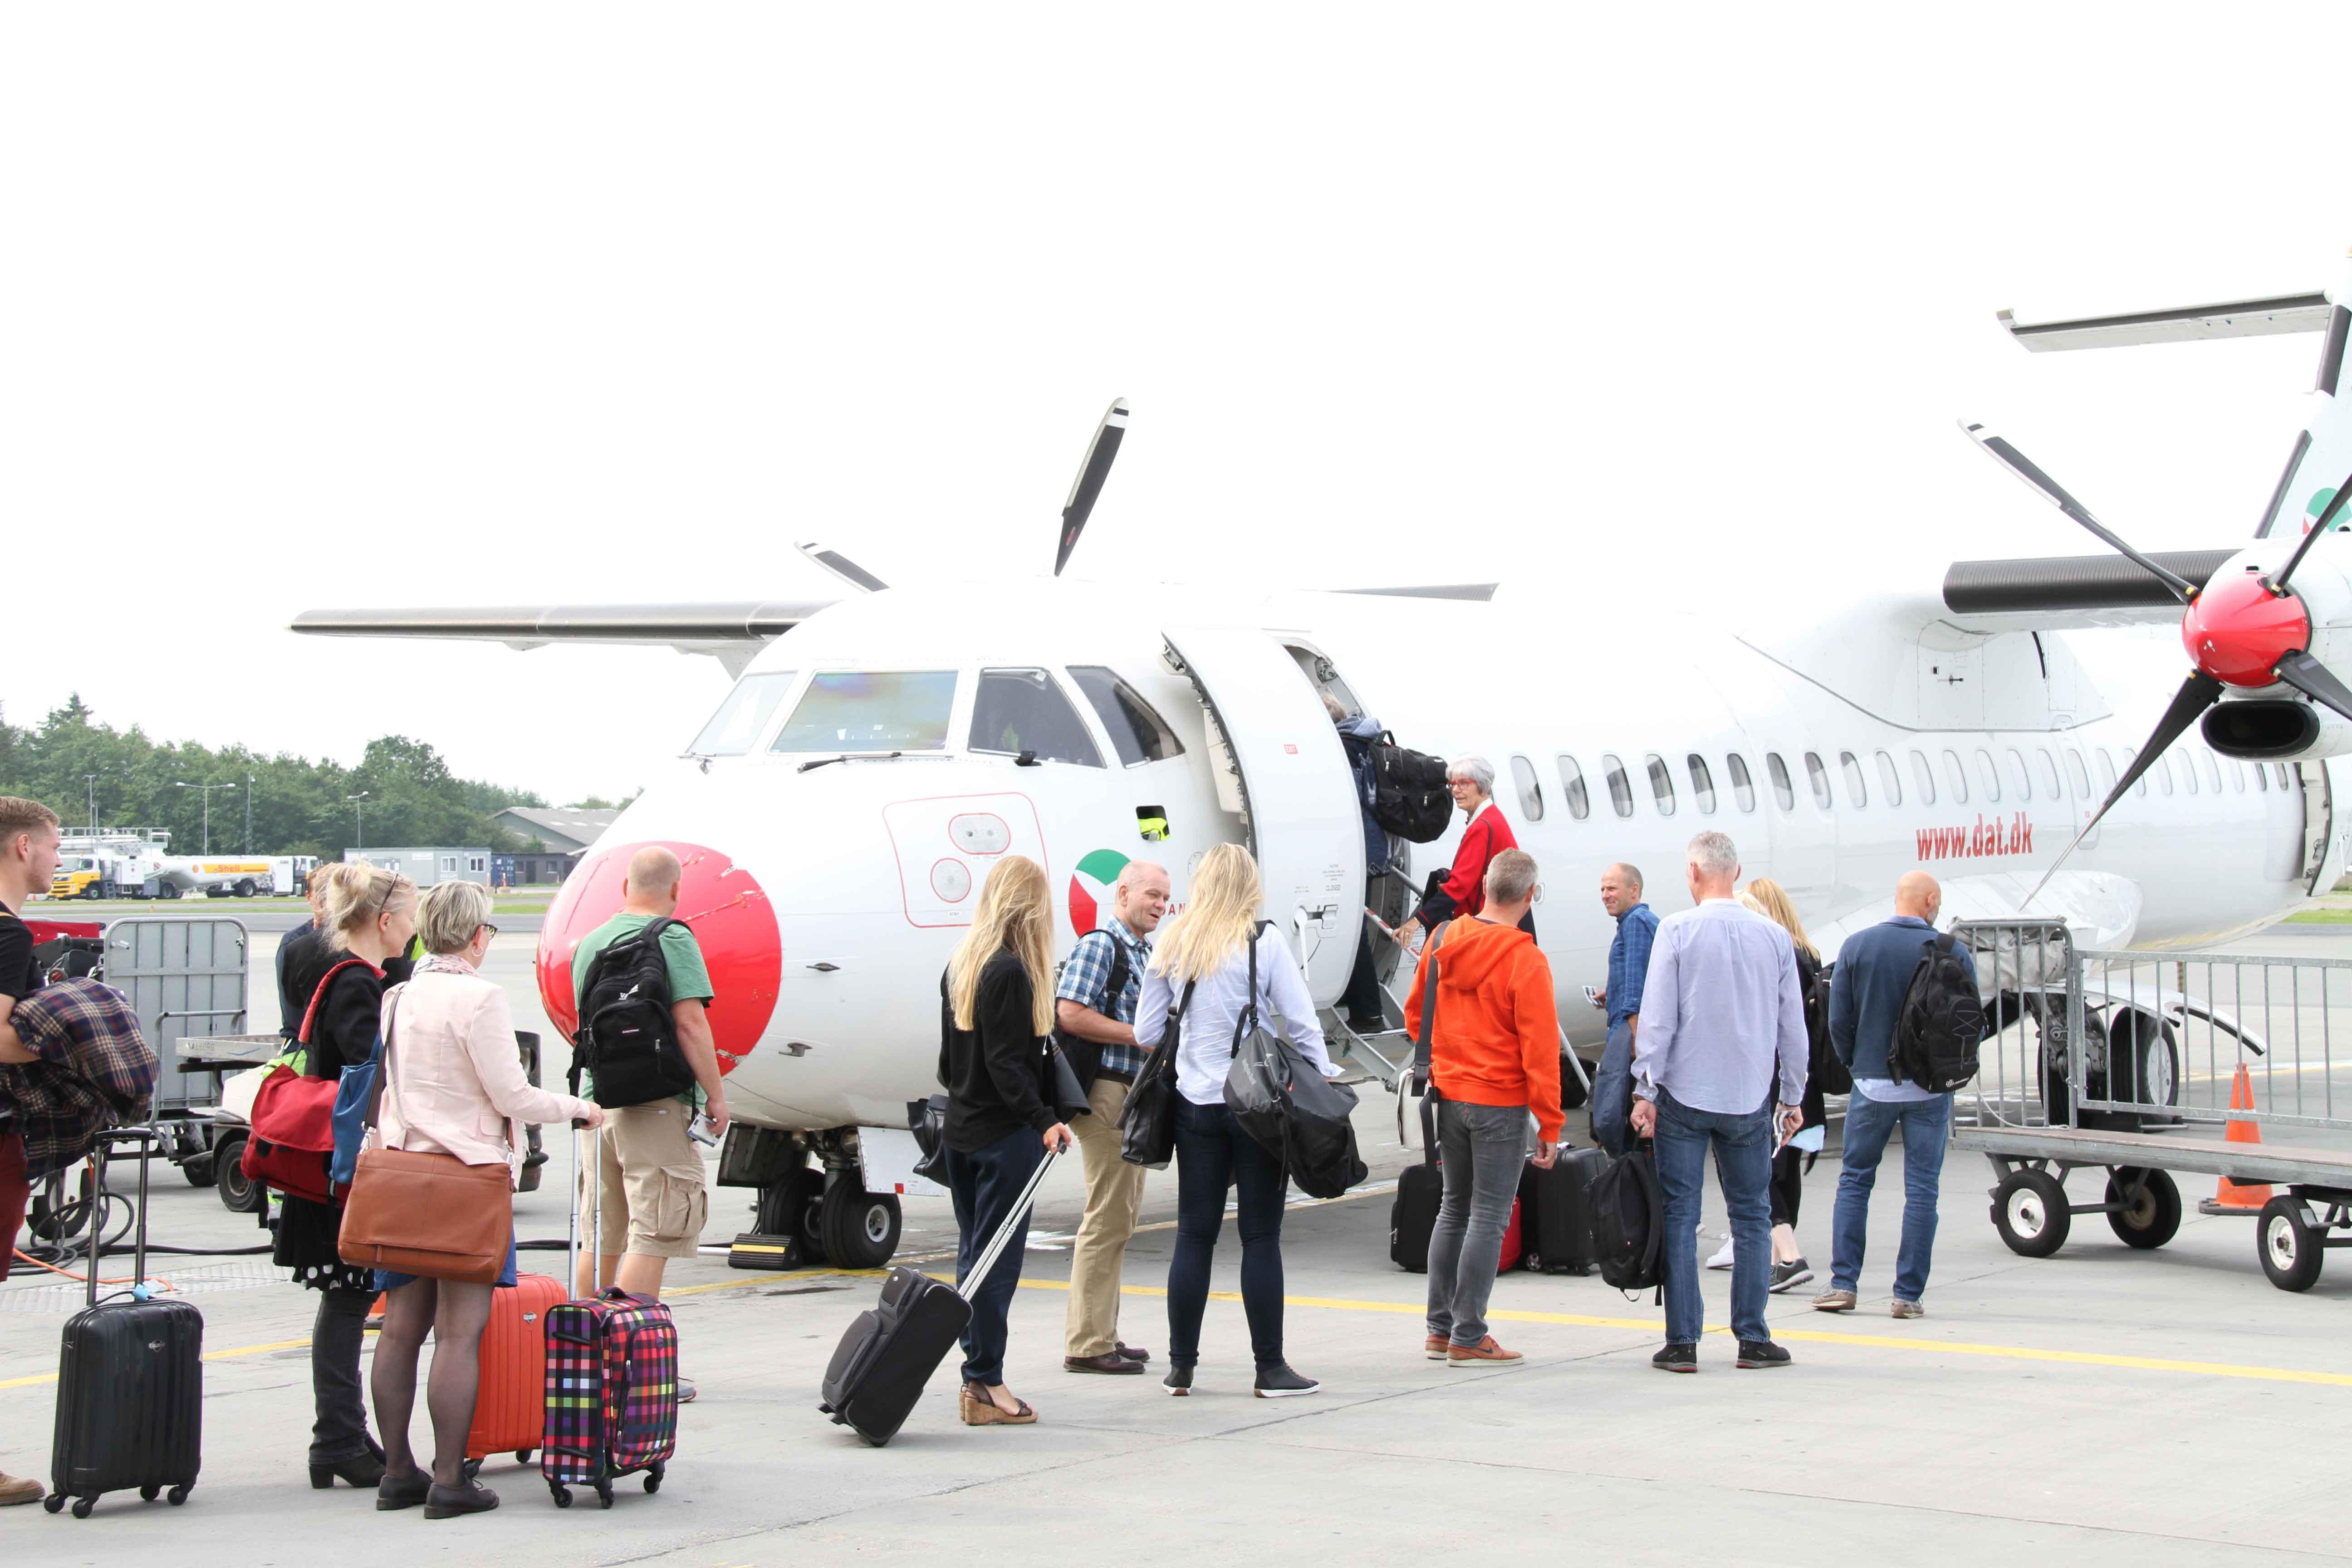 ATR72-fly fra DAT i Aalborg Lufthavn. (Foto: Bornholmerflyet.dk)